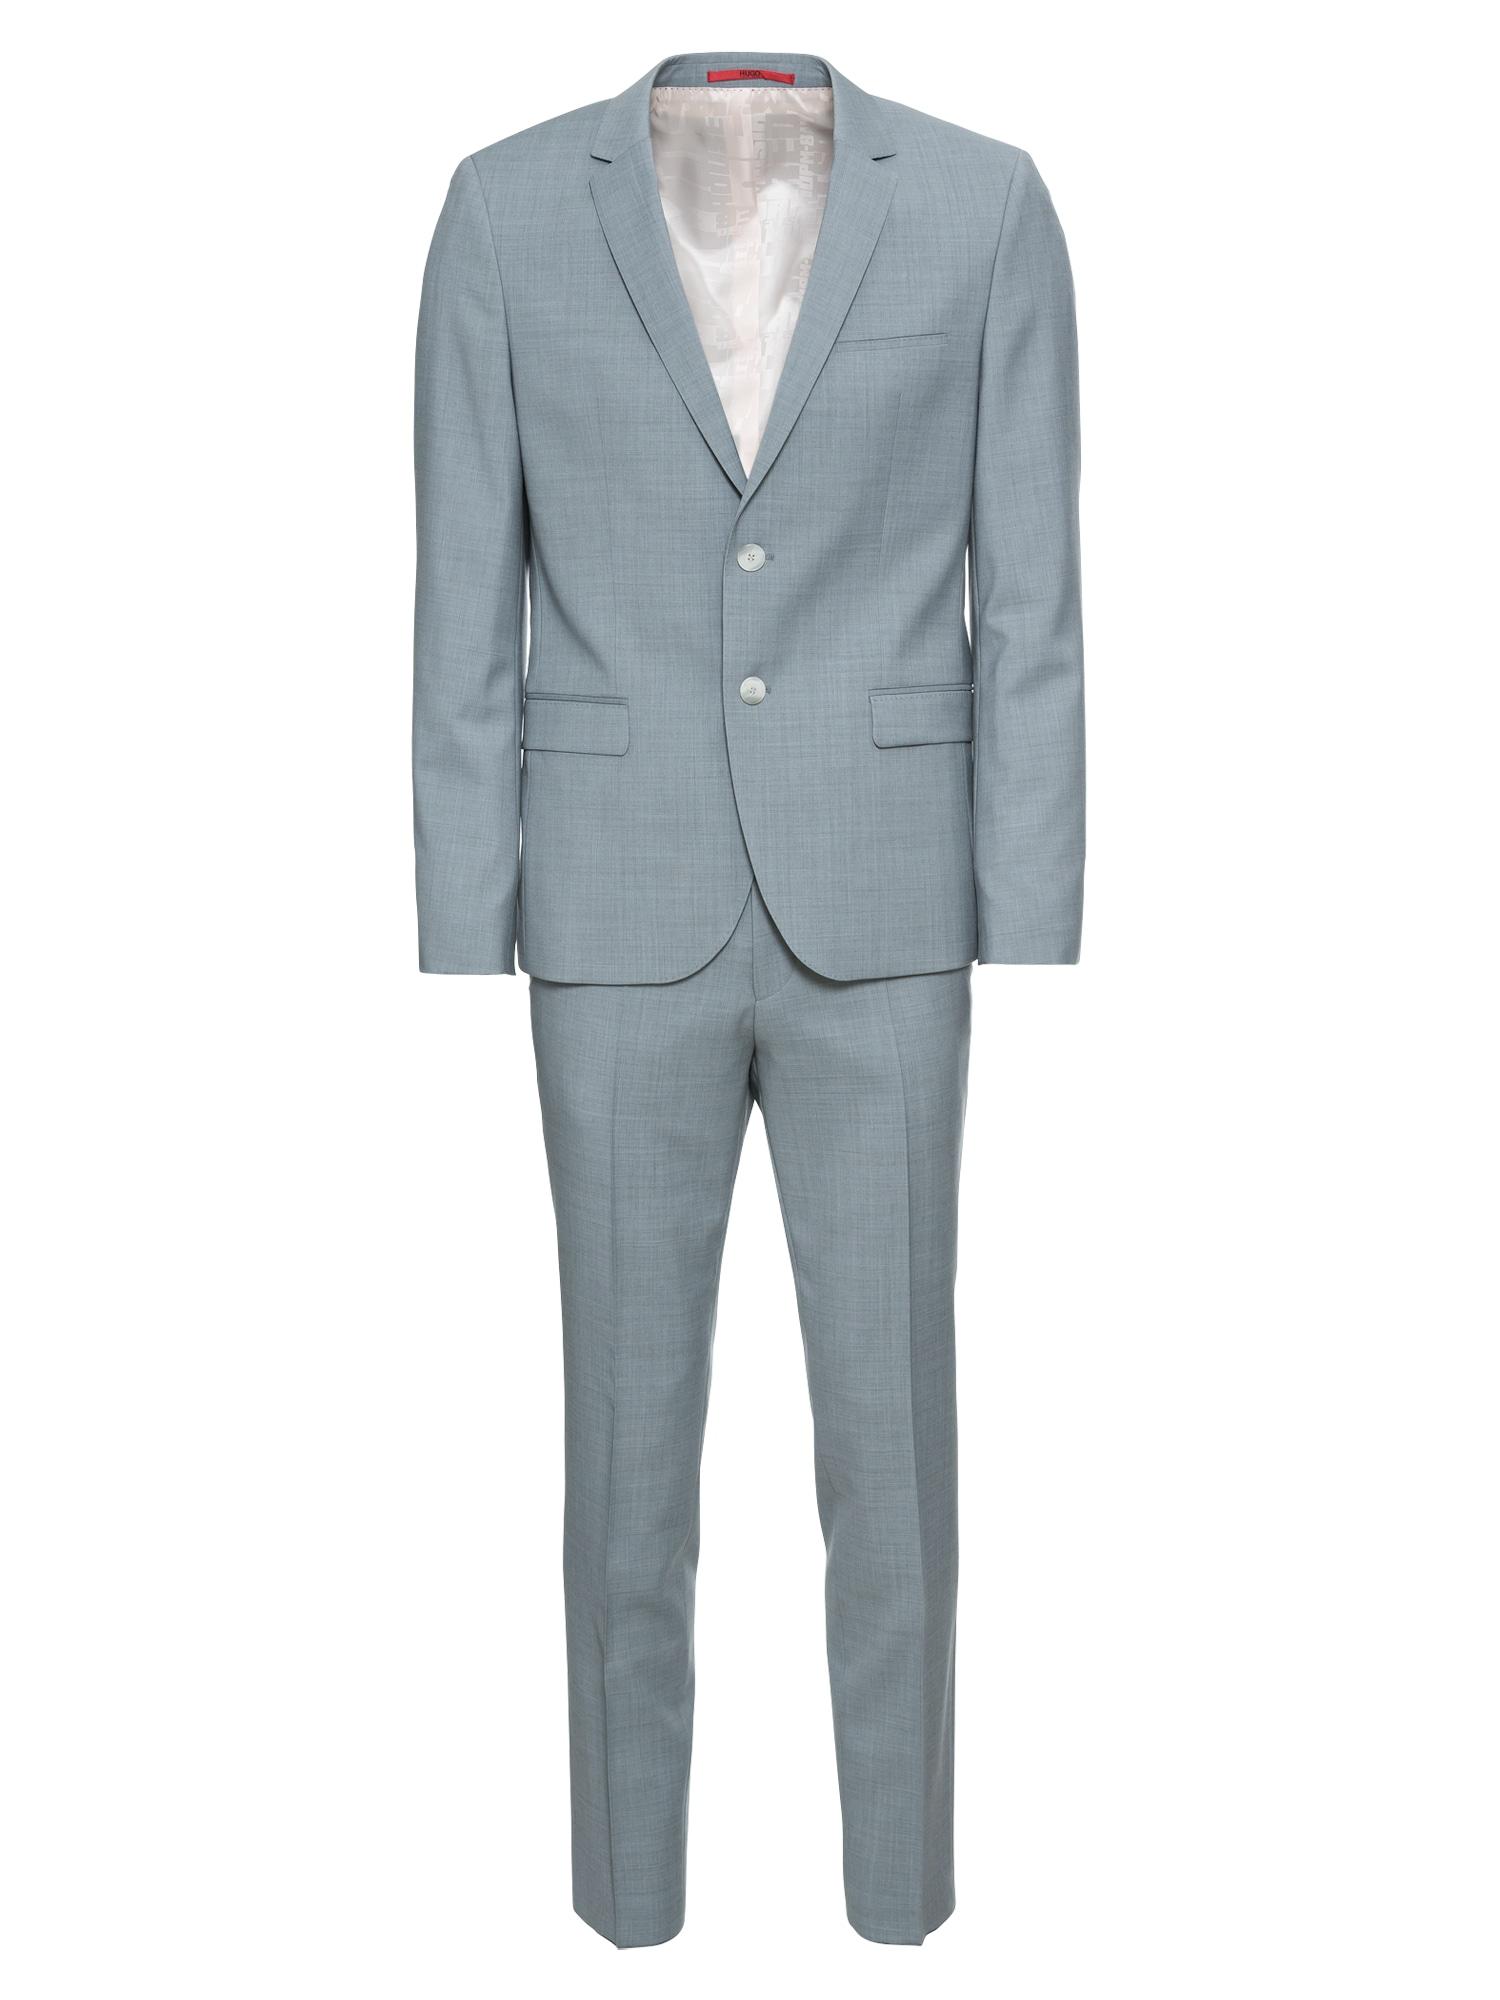 Oblek ArtiHesten182 světlemodrá HUGO